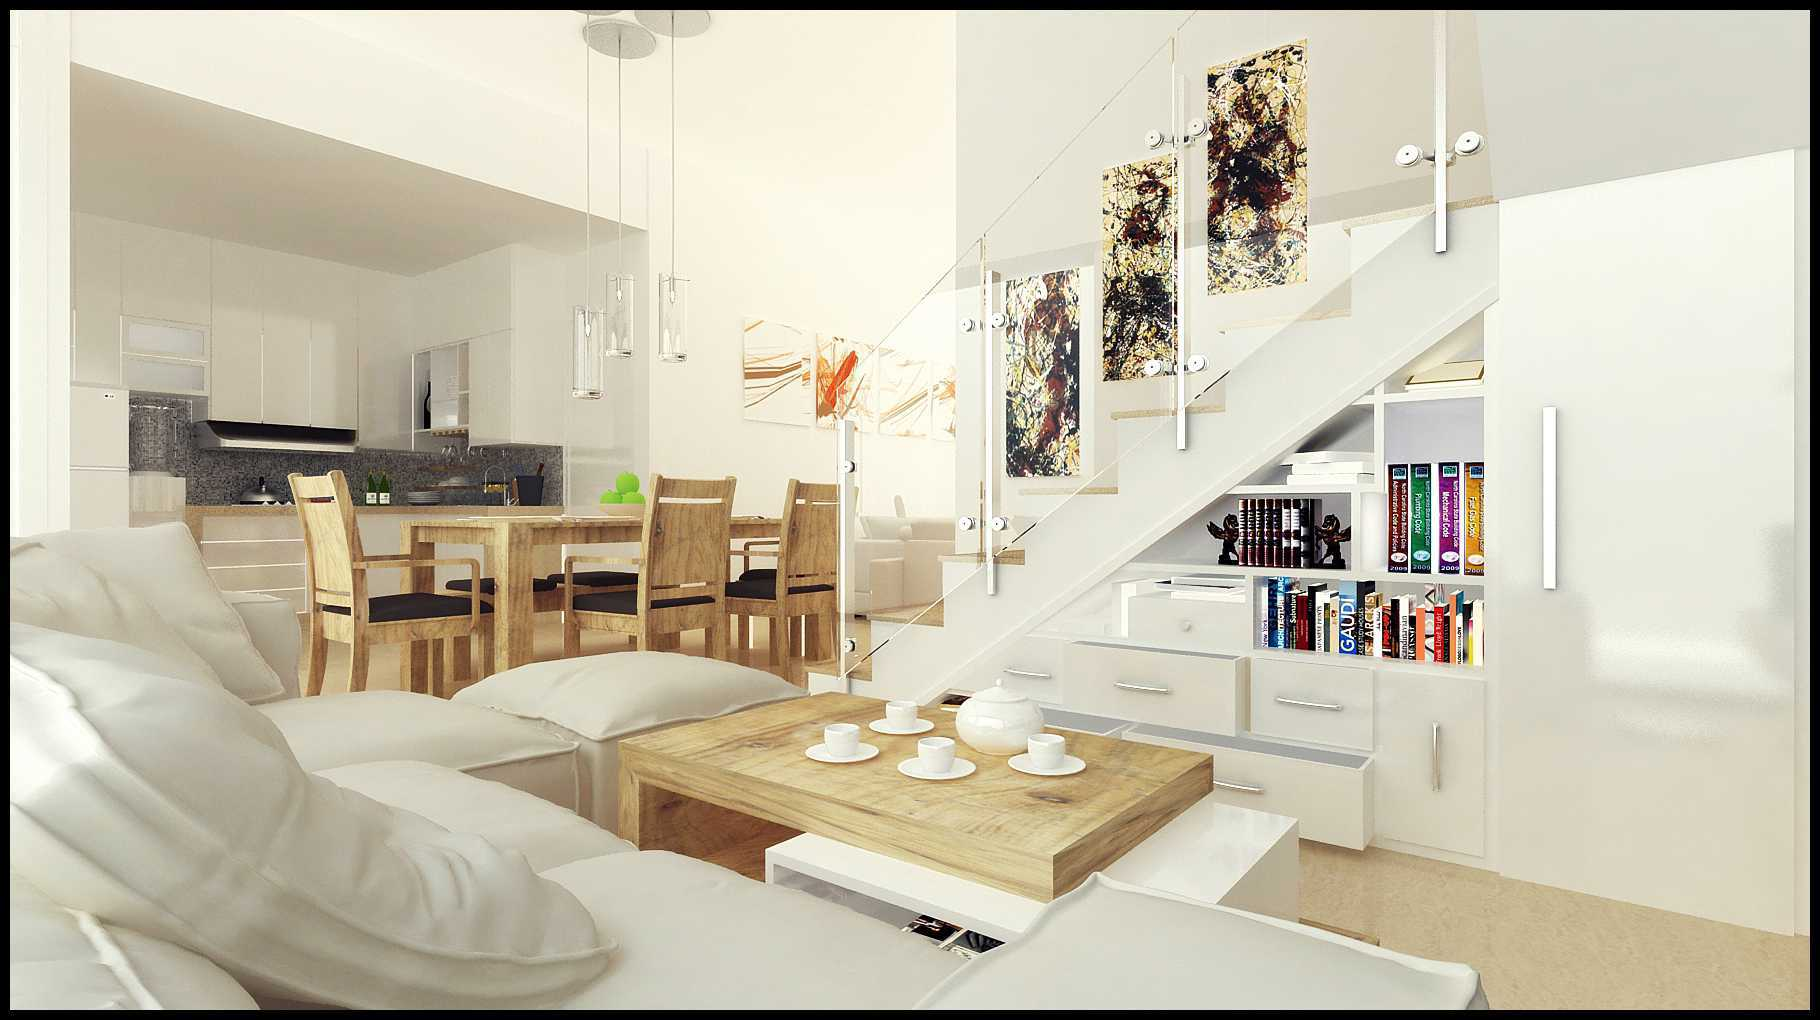 Miv Architects (Ar. Muhammad Ikhsan Hamiru, Iai & Partners) Desain Rehabilitasi Rumah Phinisi Makassar | With Pt.dap Makassar Makassar Photo-27700 Modern  27700